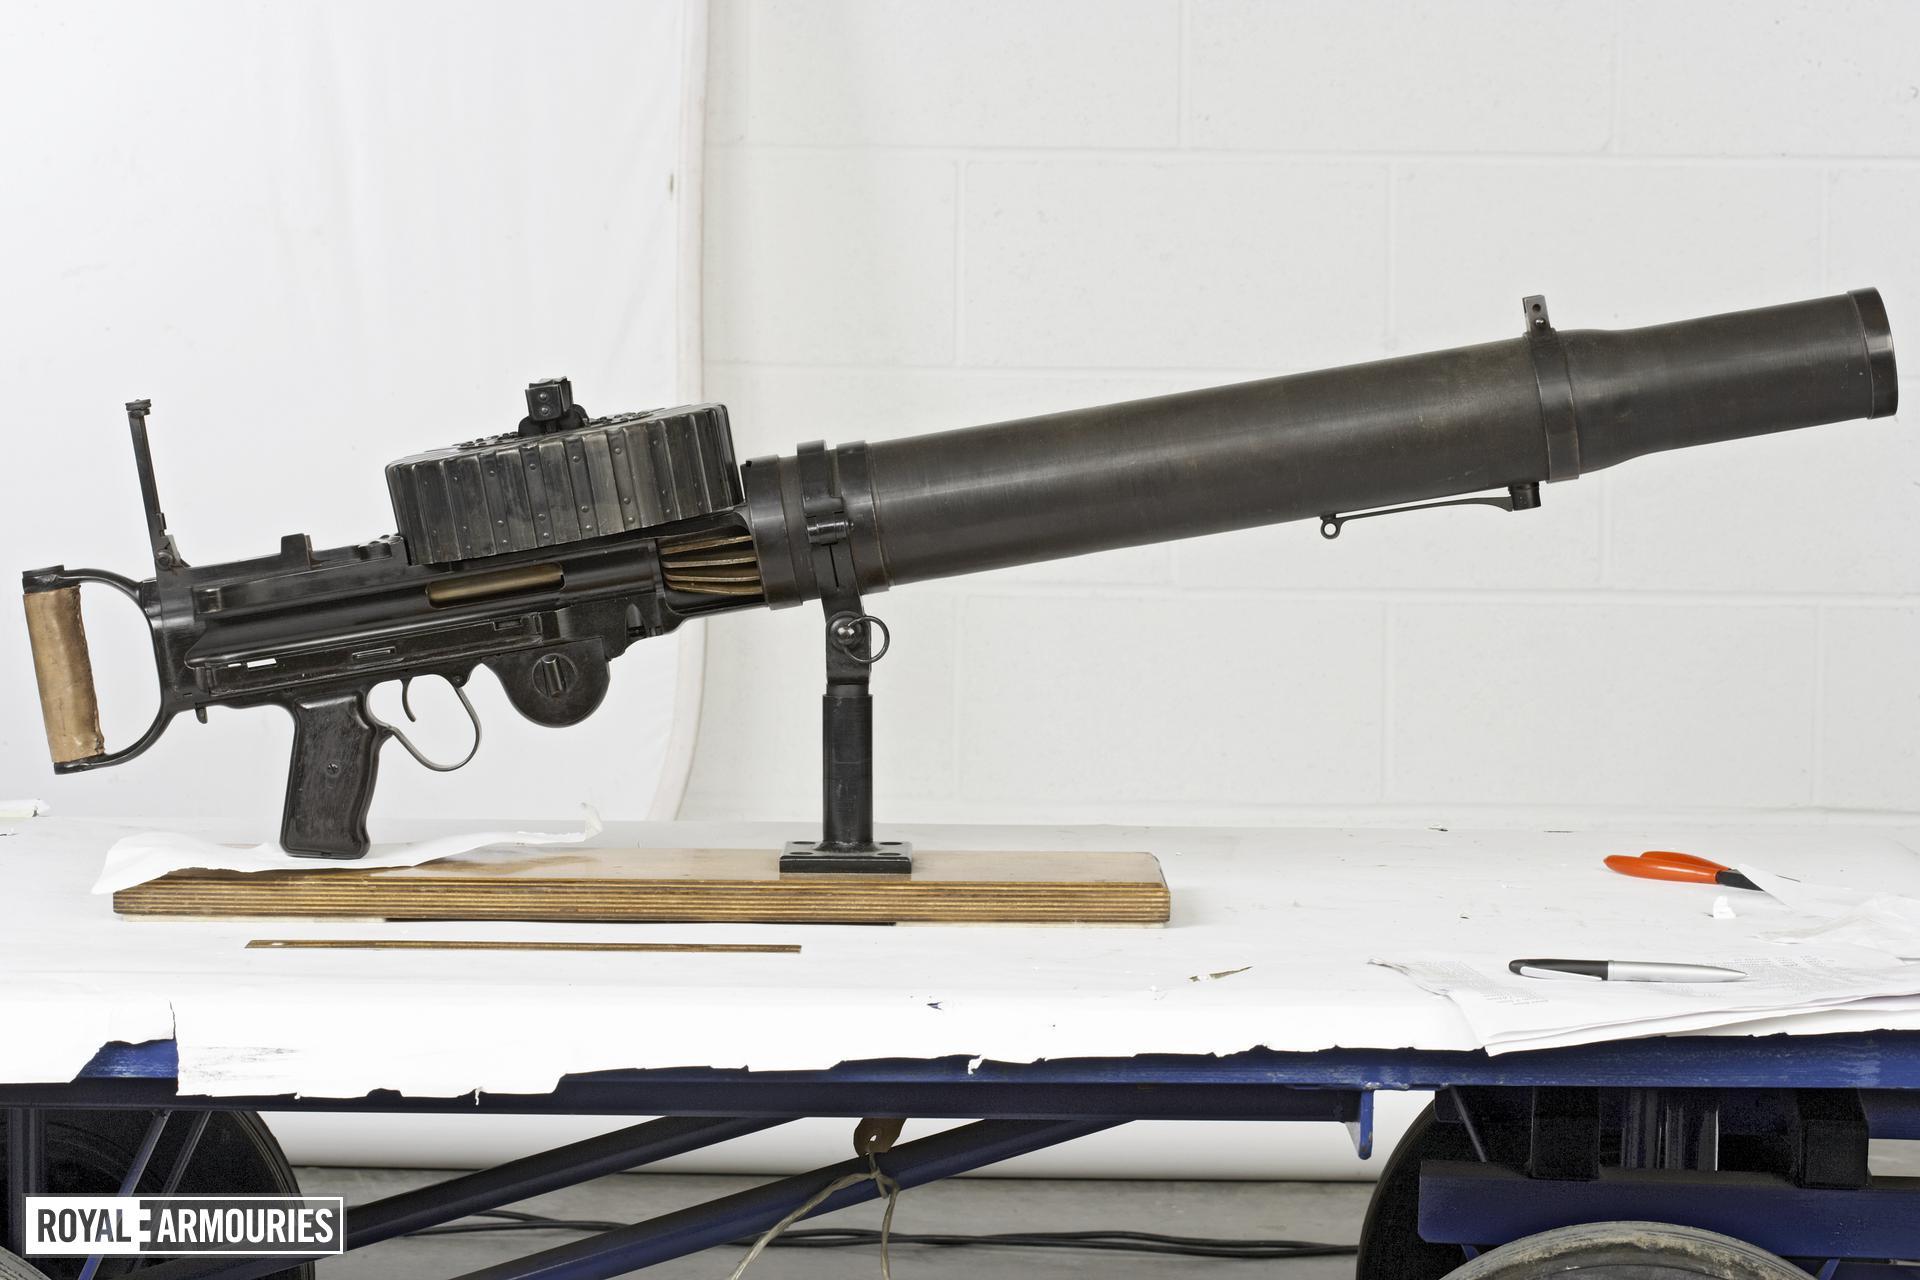 Centrefire automatic light machine gun - Lewis Type 92